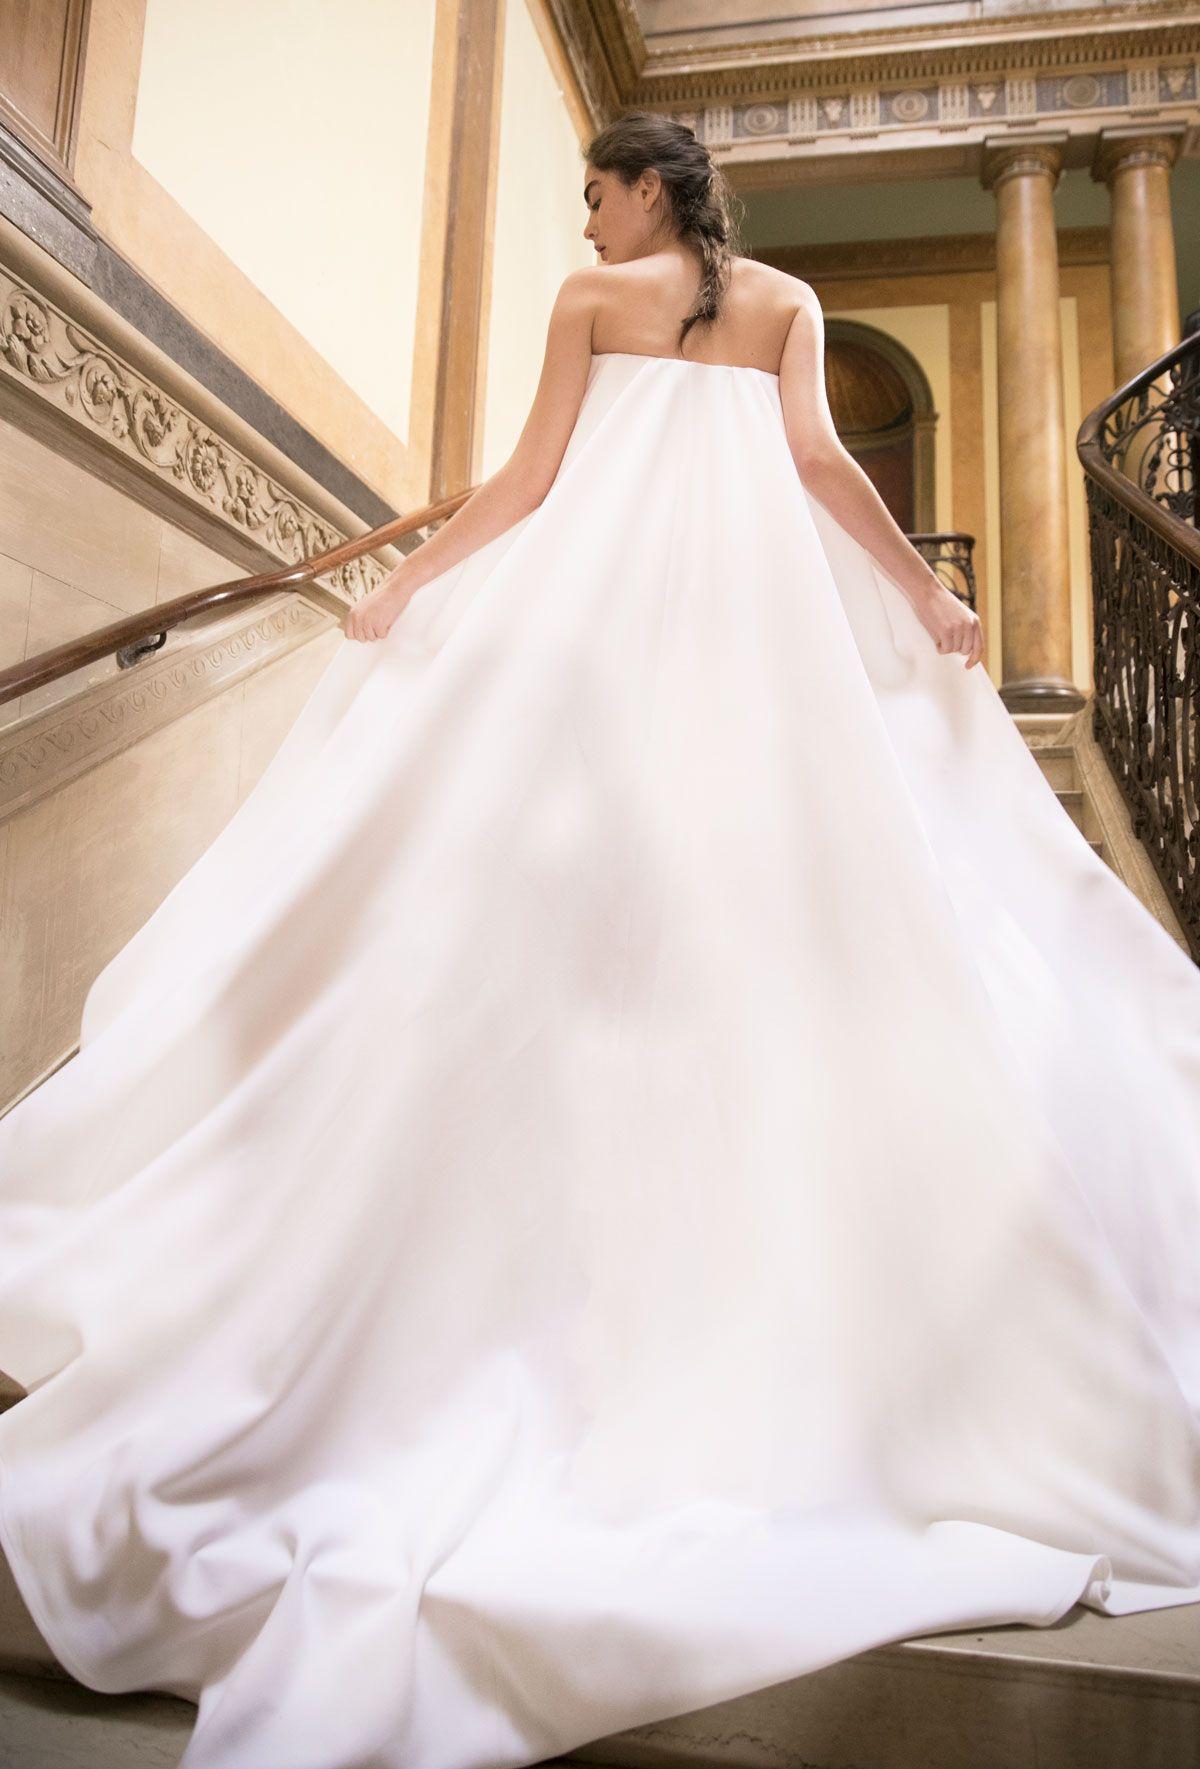 Carolina Herrera Spring 2019 Bridal Collection Carolina Herrera Bridal Carolina Herrera Bride Bridal